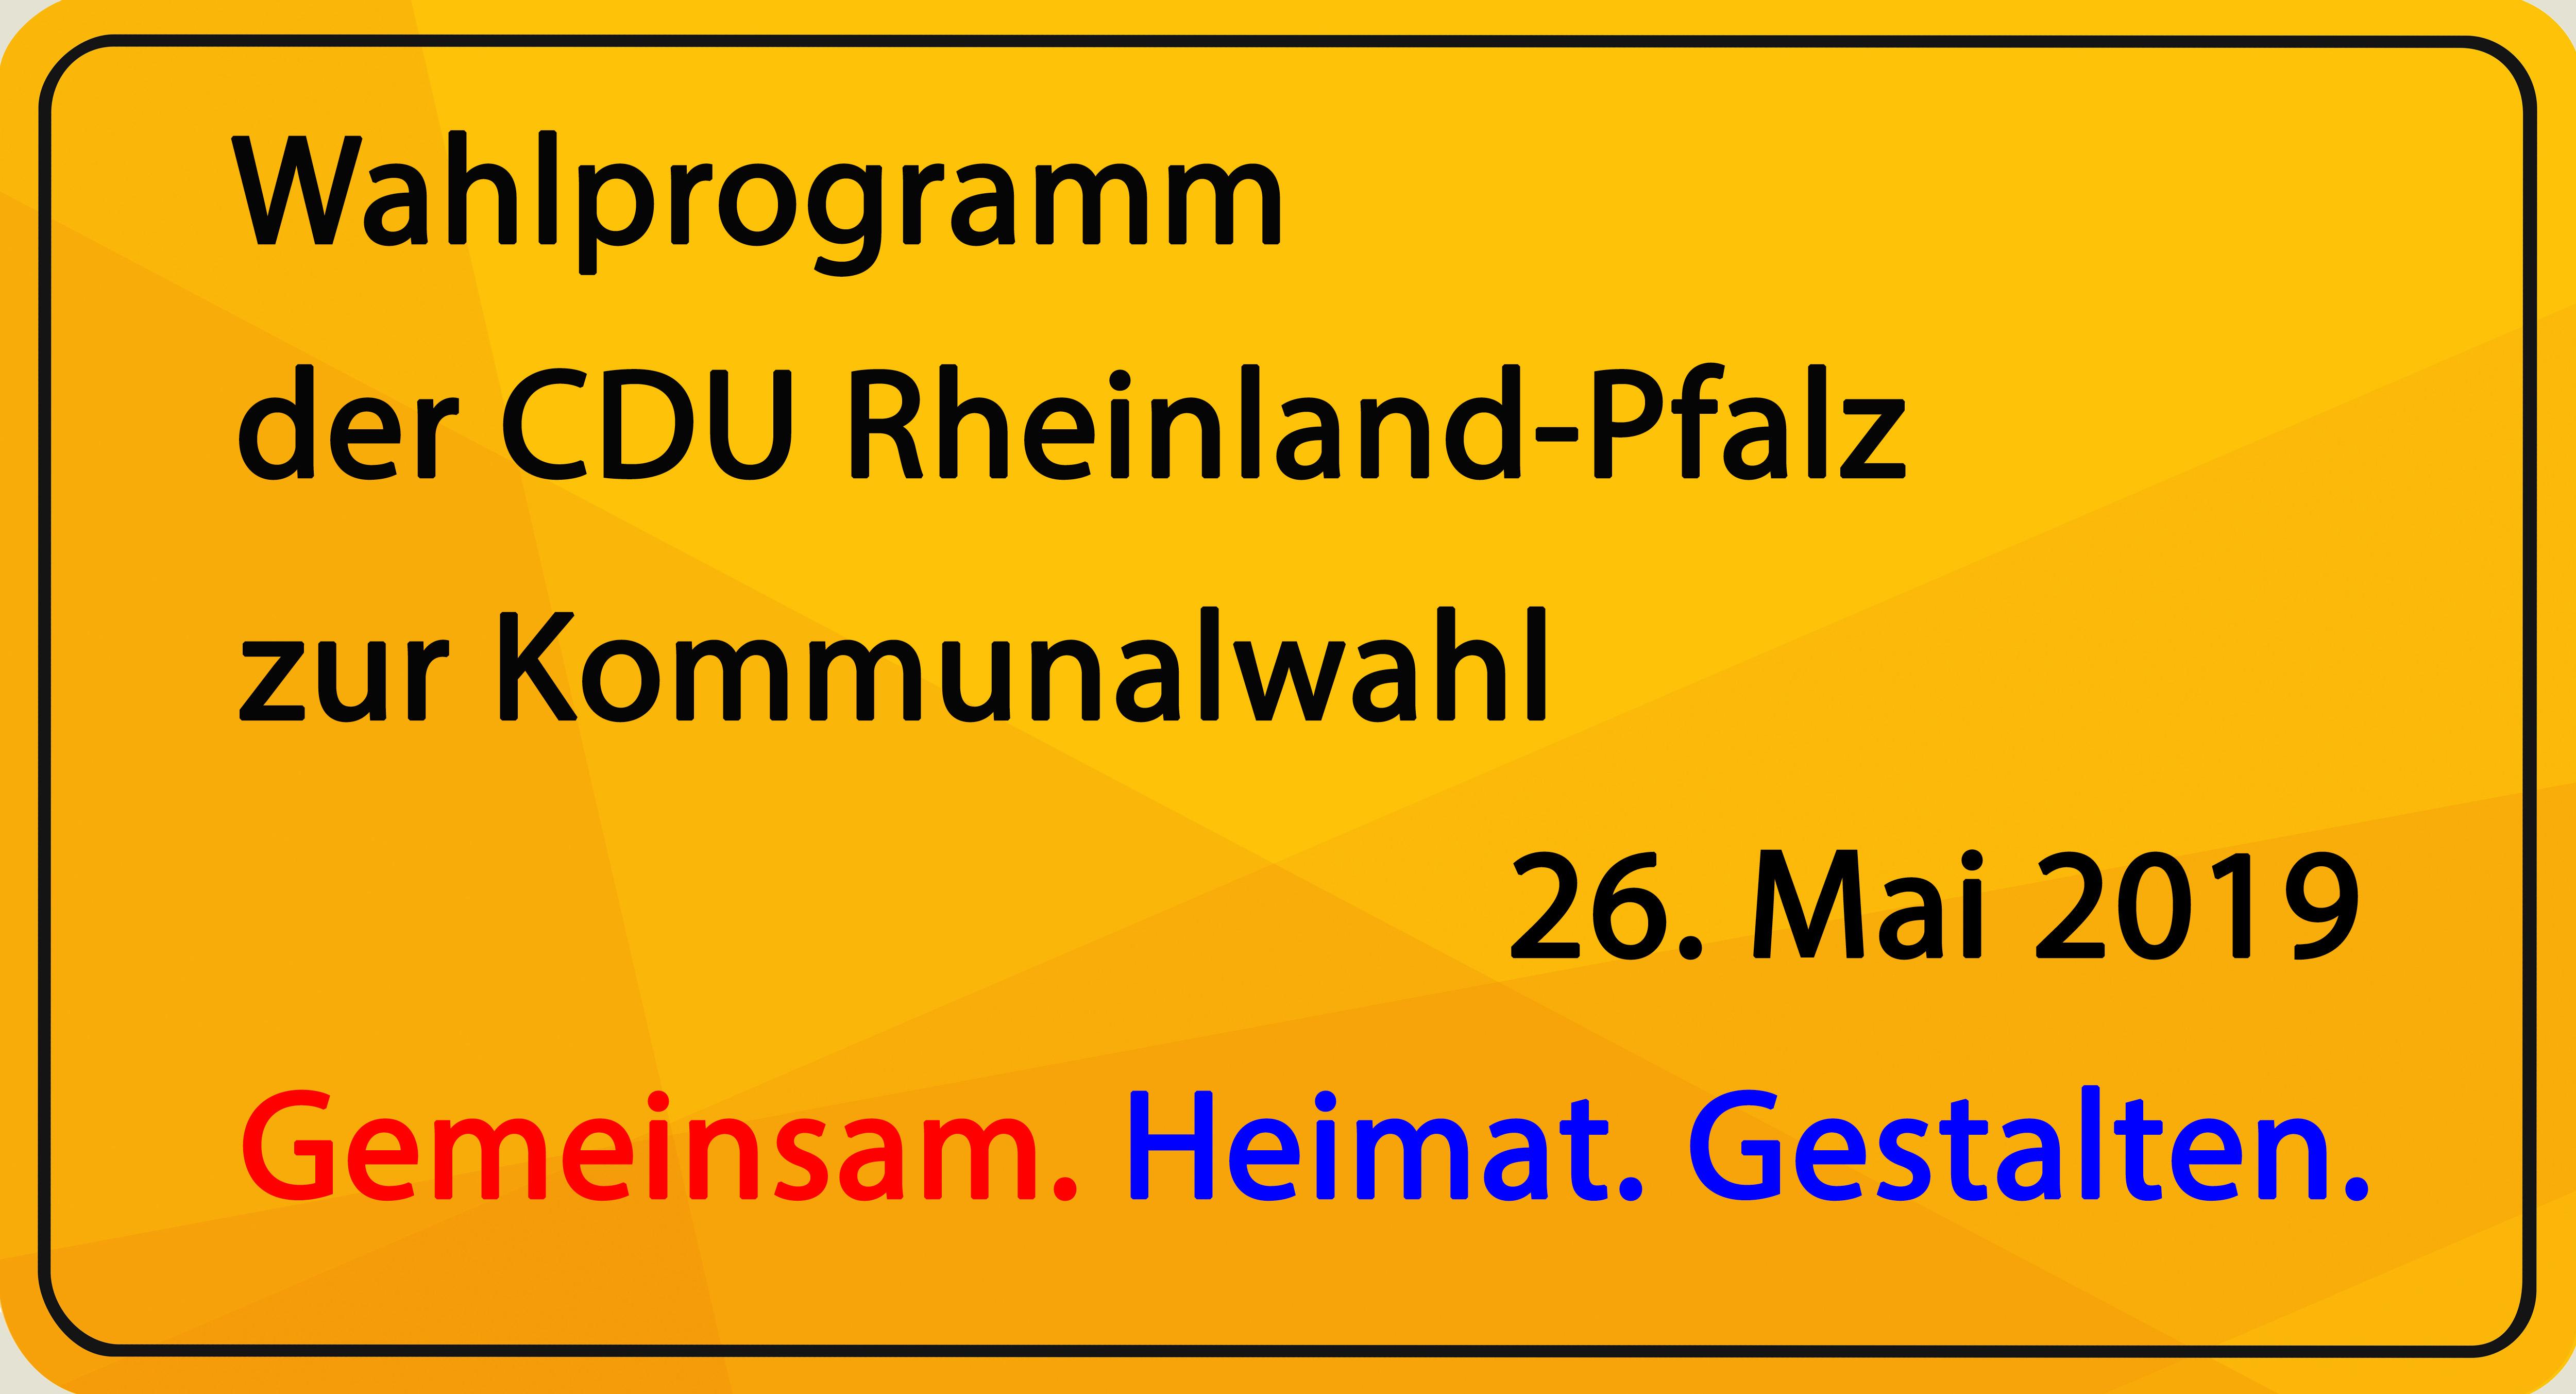 Wahlprogramm CDU Pheinland-Pfalz 2019